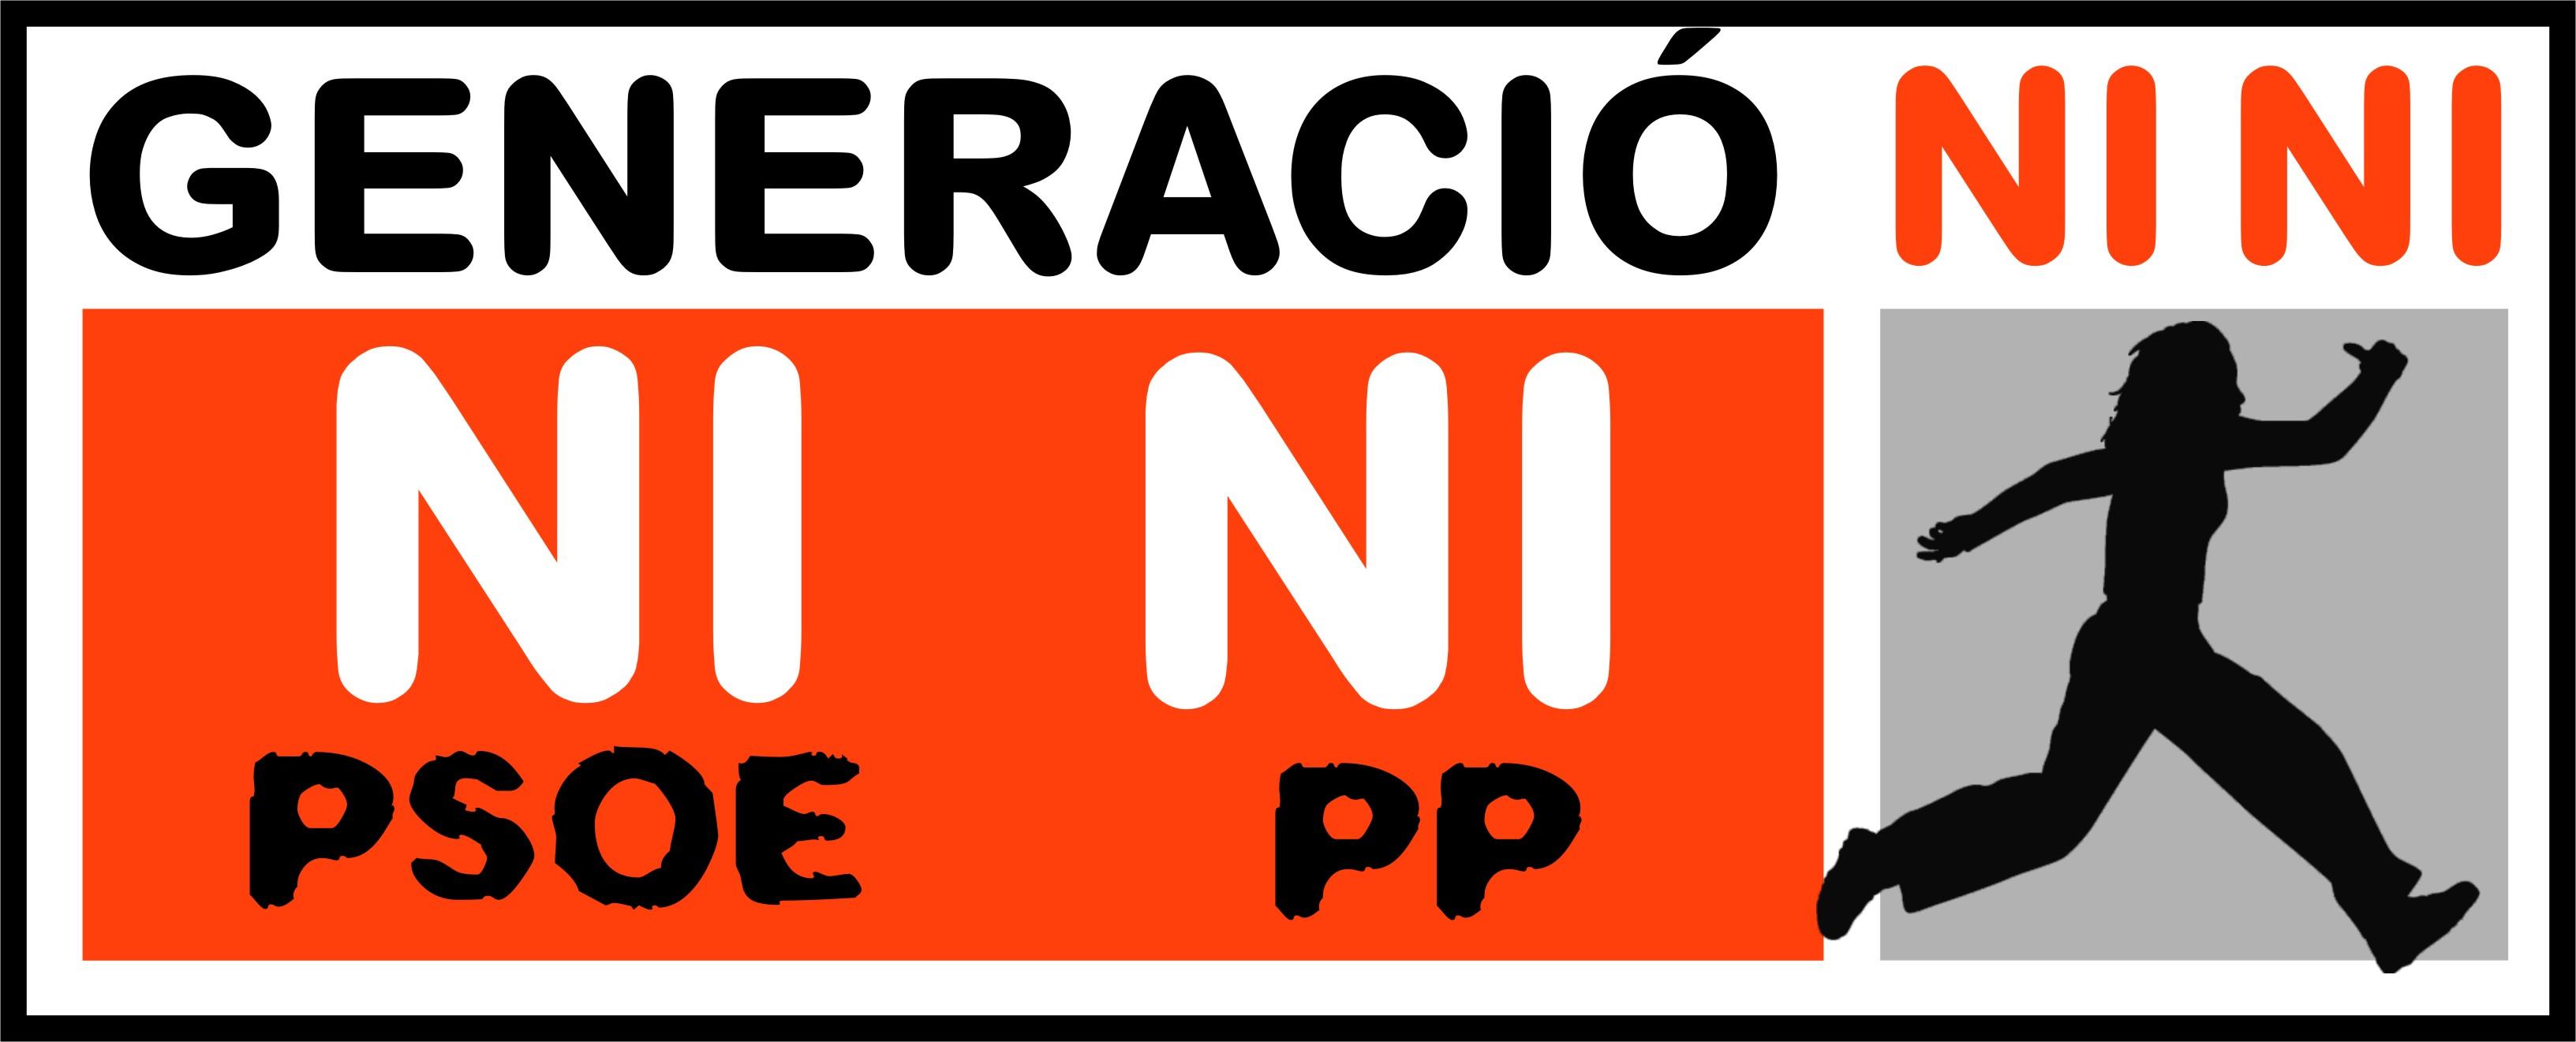 https://www.noentiendonada.es/wp-content/uploads/generacion-nini-ni-psoe-ni-pp.jpg